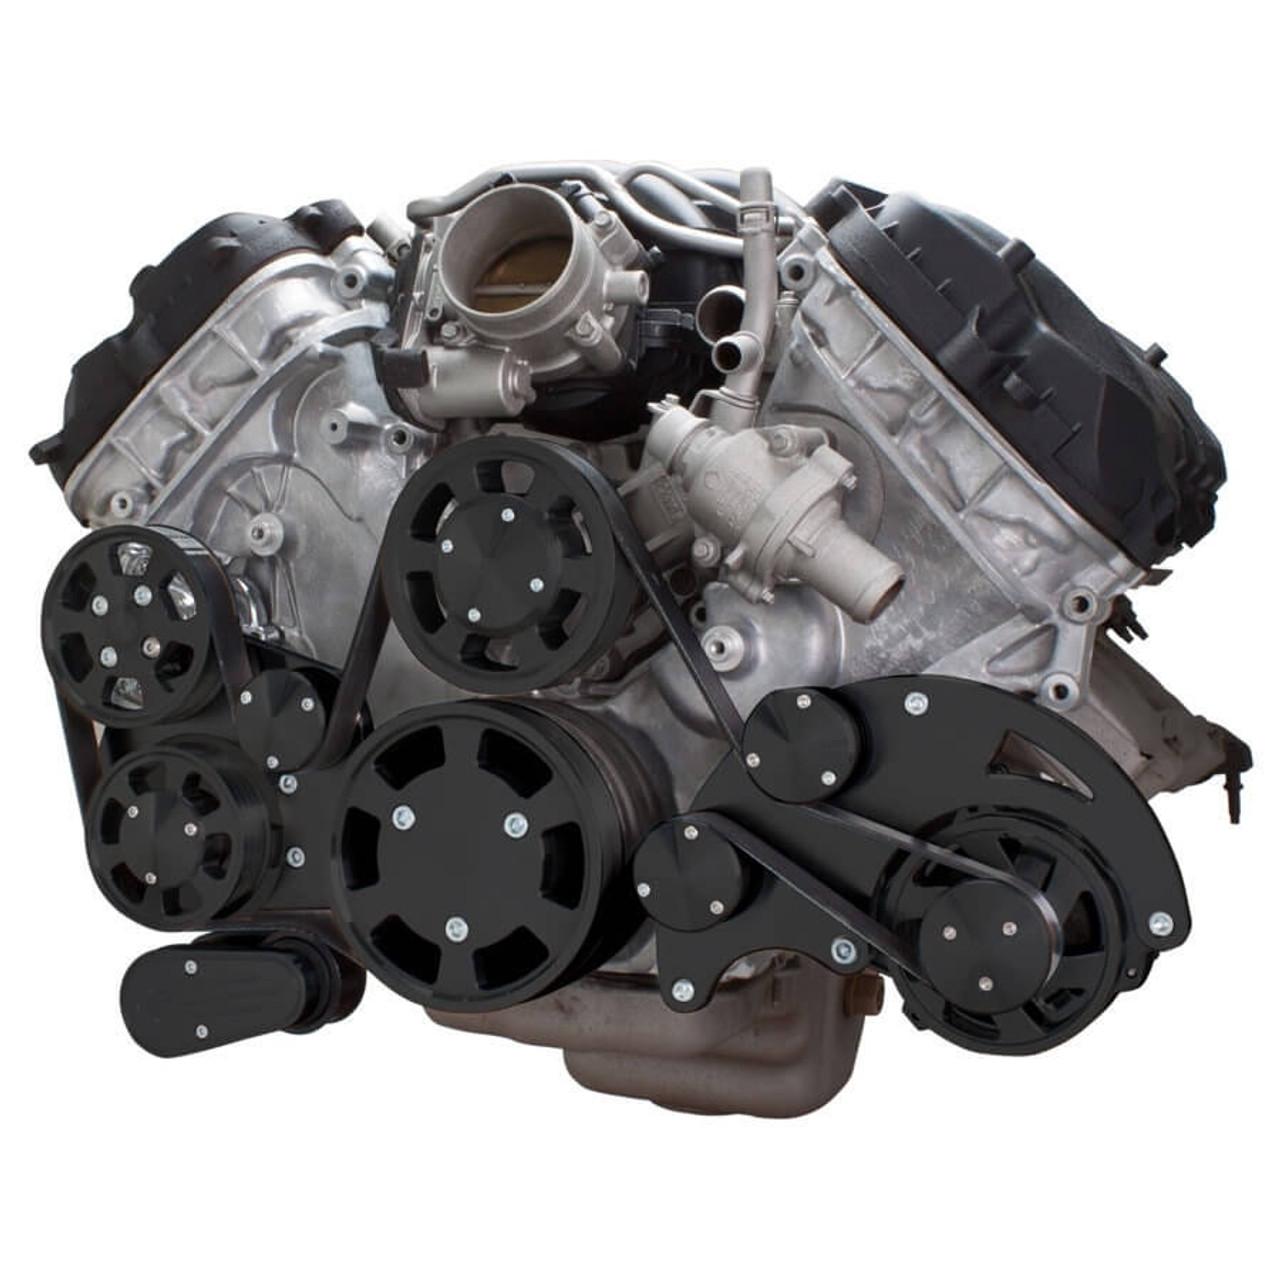 medium resolution of stealth black serpentine system for ford coyote 5 0 alternator power steering